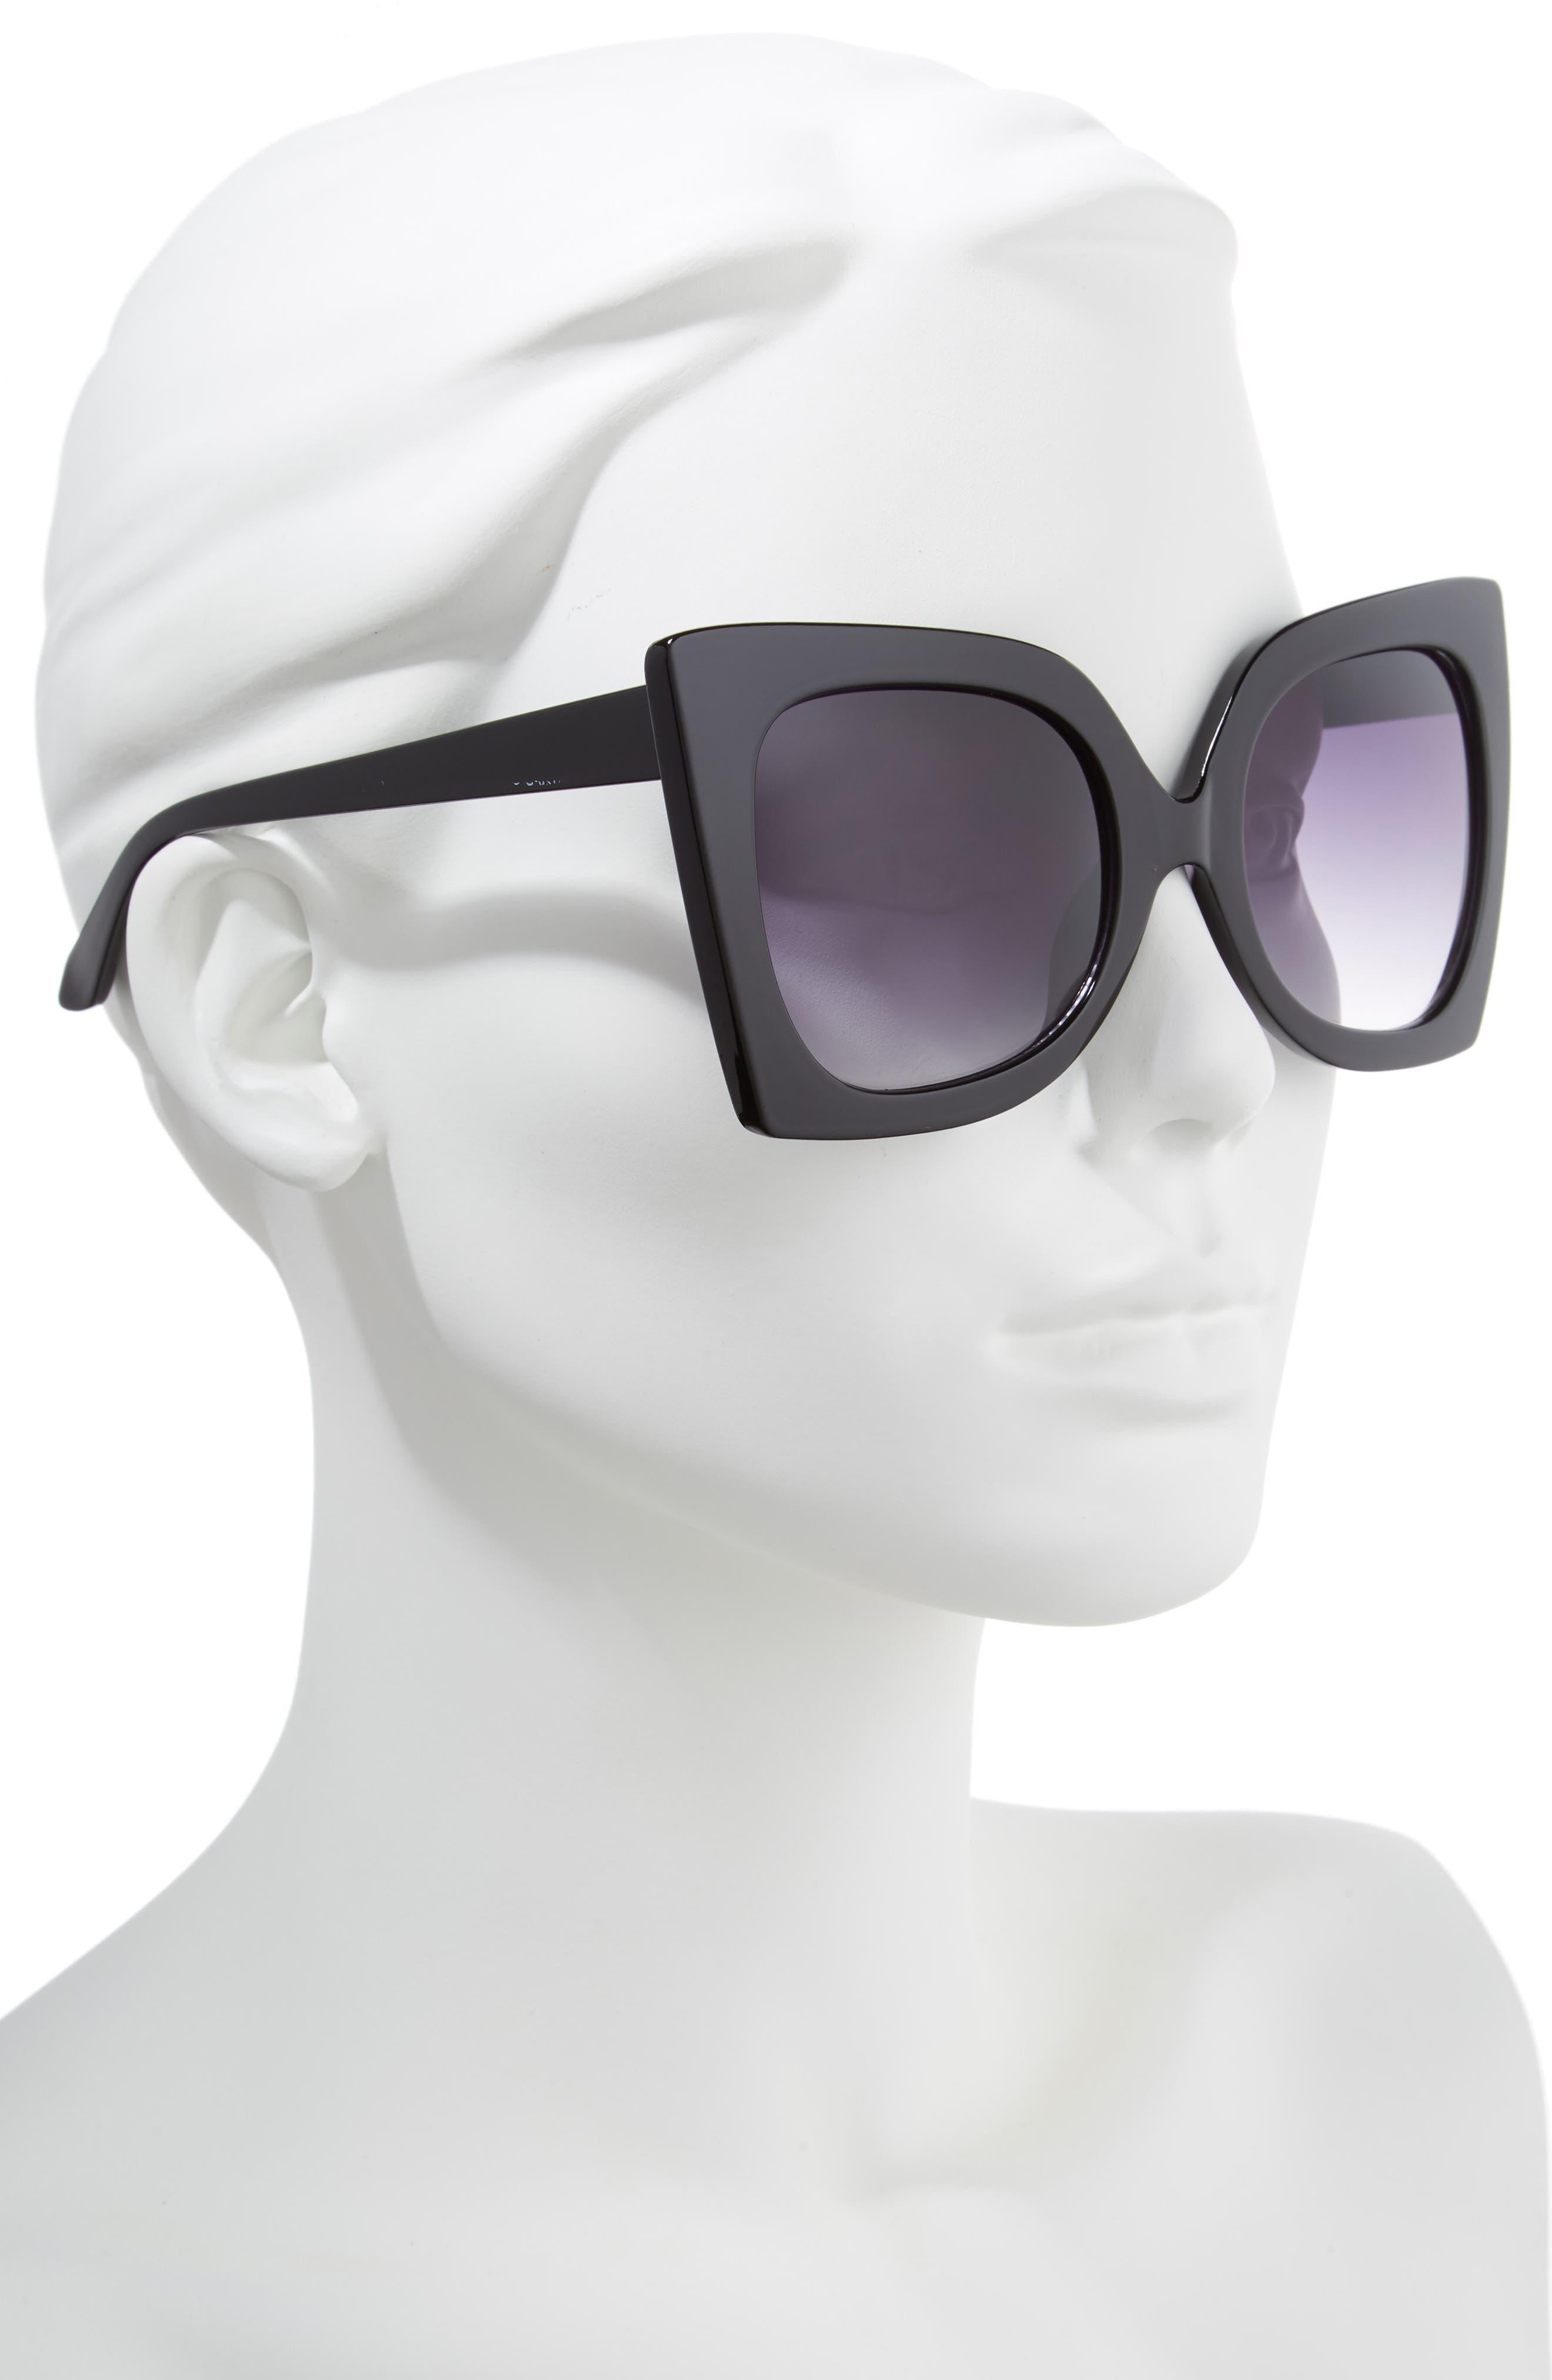 56mm Exaggerated Square Sunglasses,                             Alternate thumbnail 2, color,                             Black